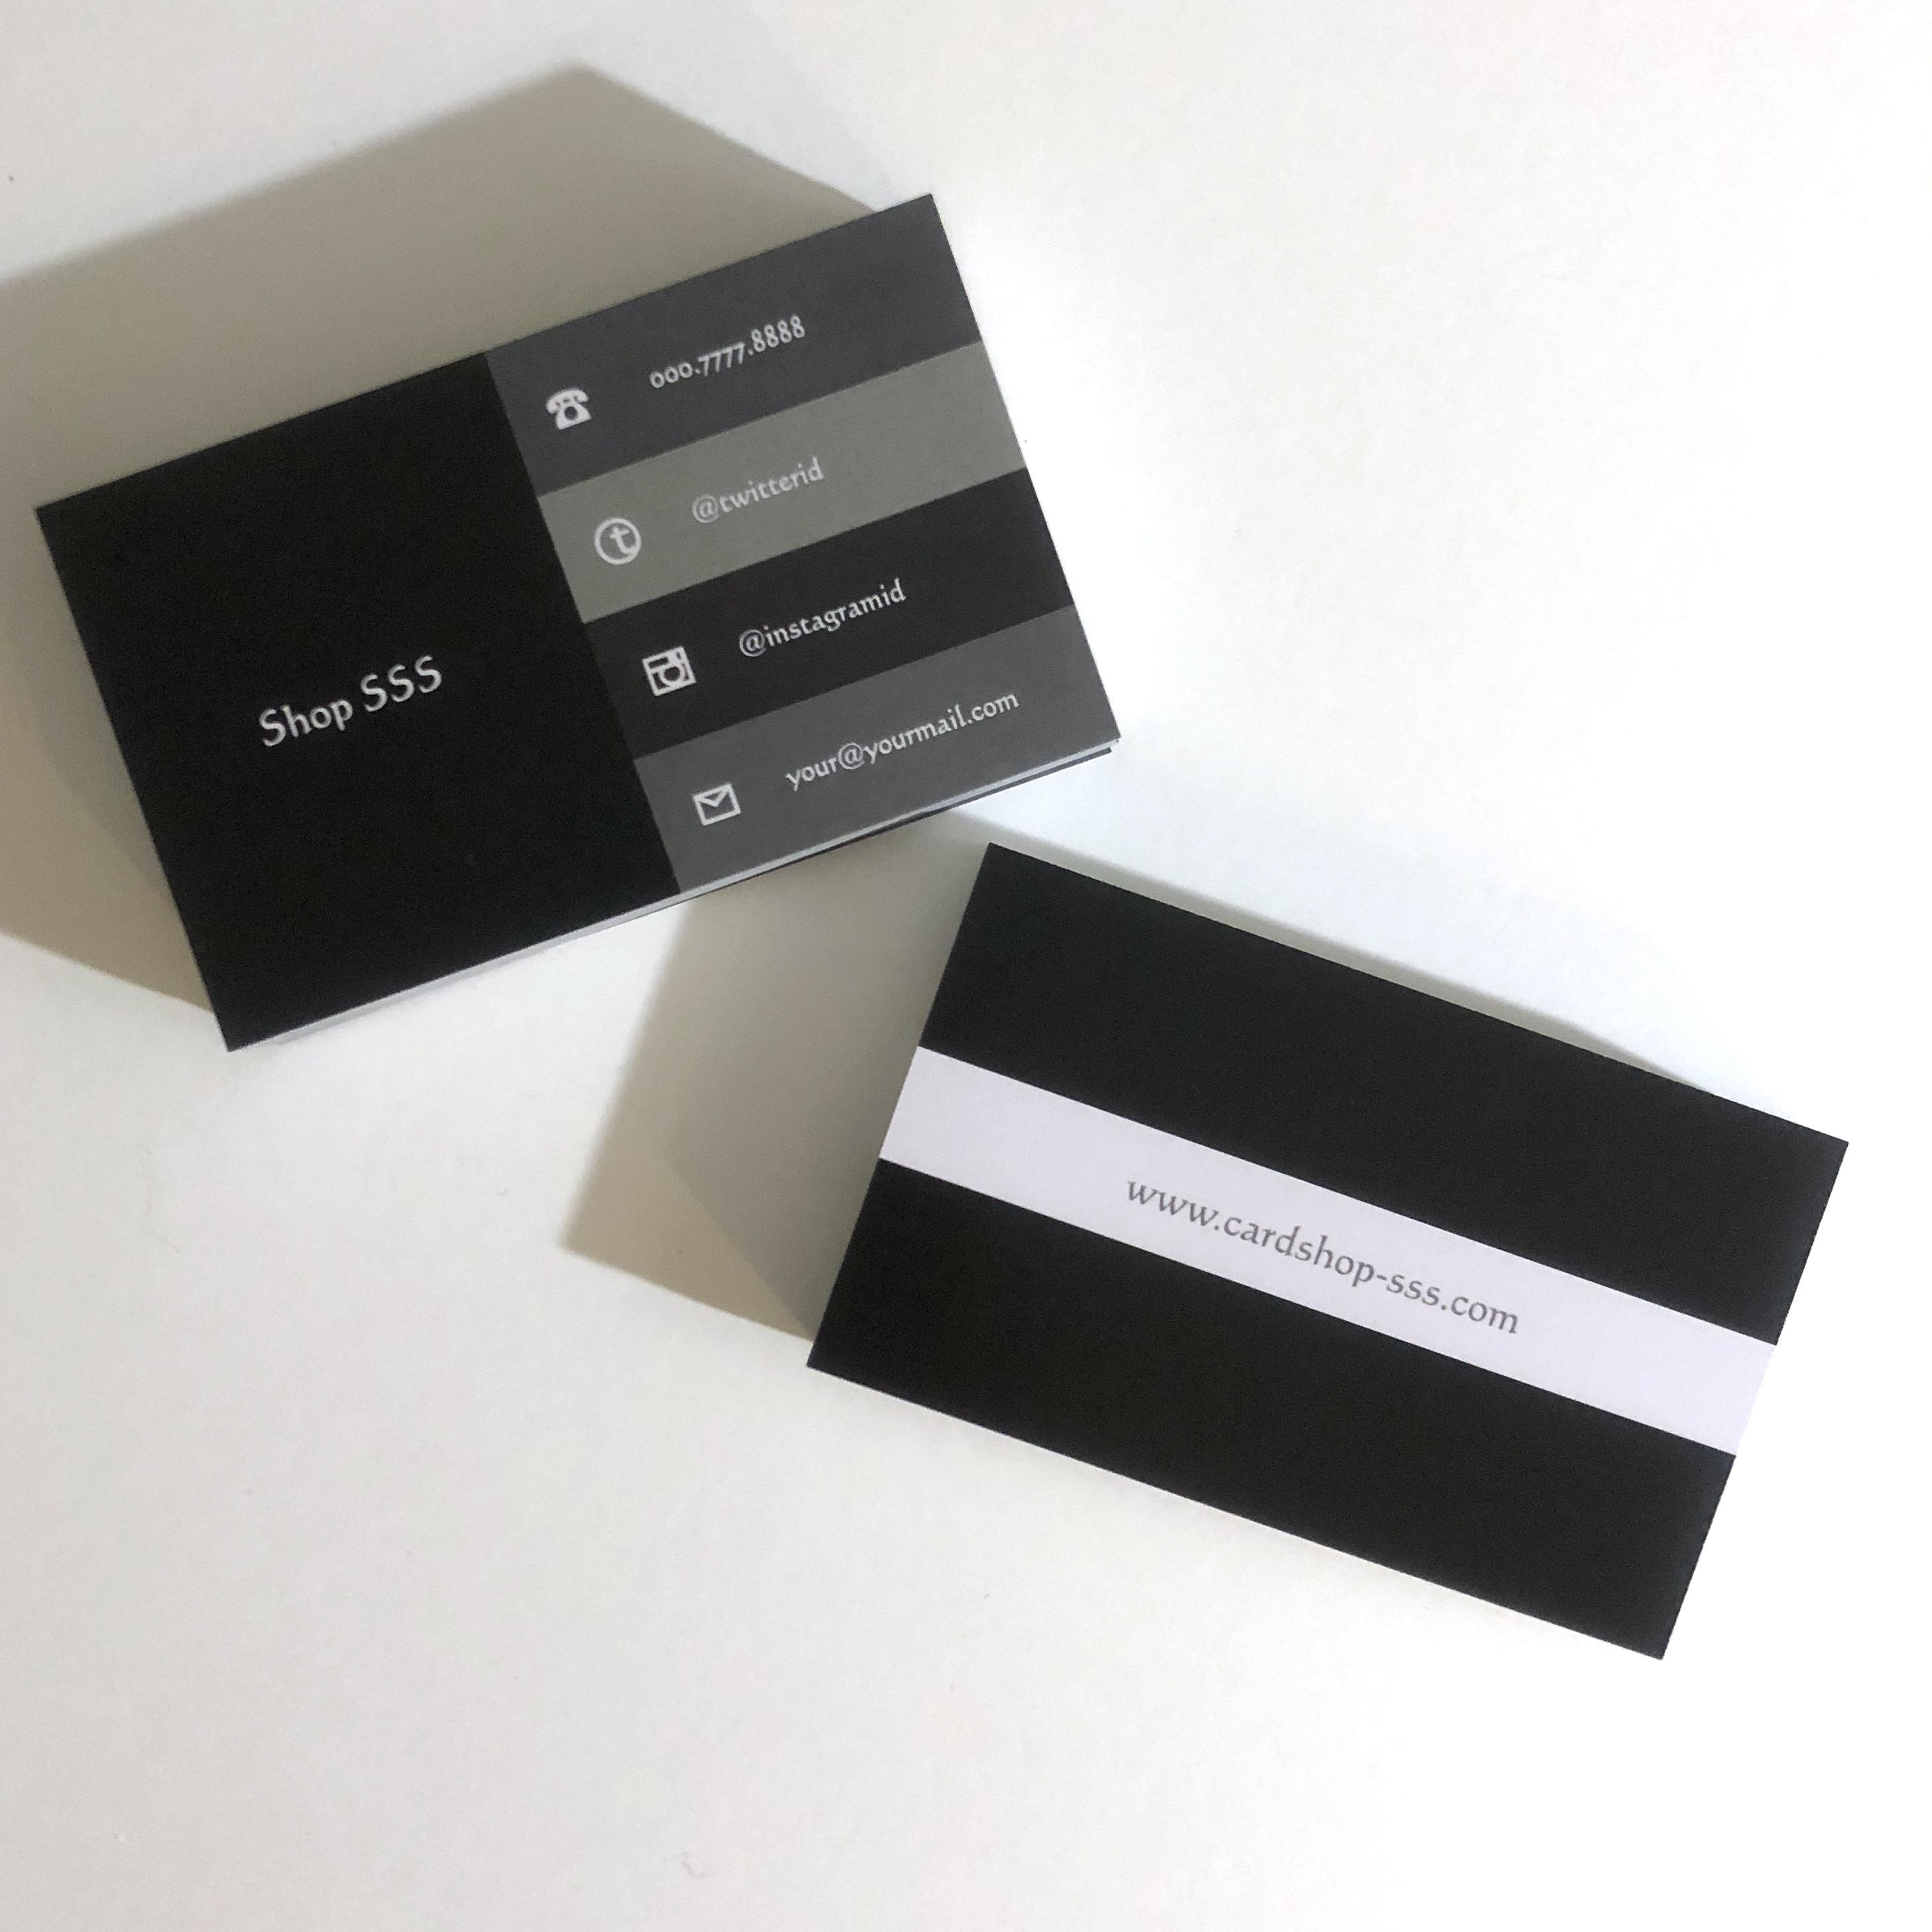 08d4_black【100枚】パーソナル名刺【ショップカード】